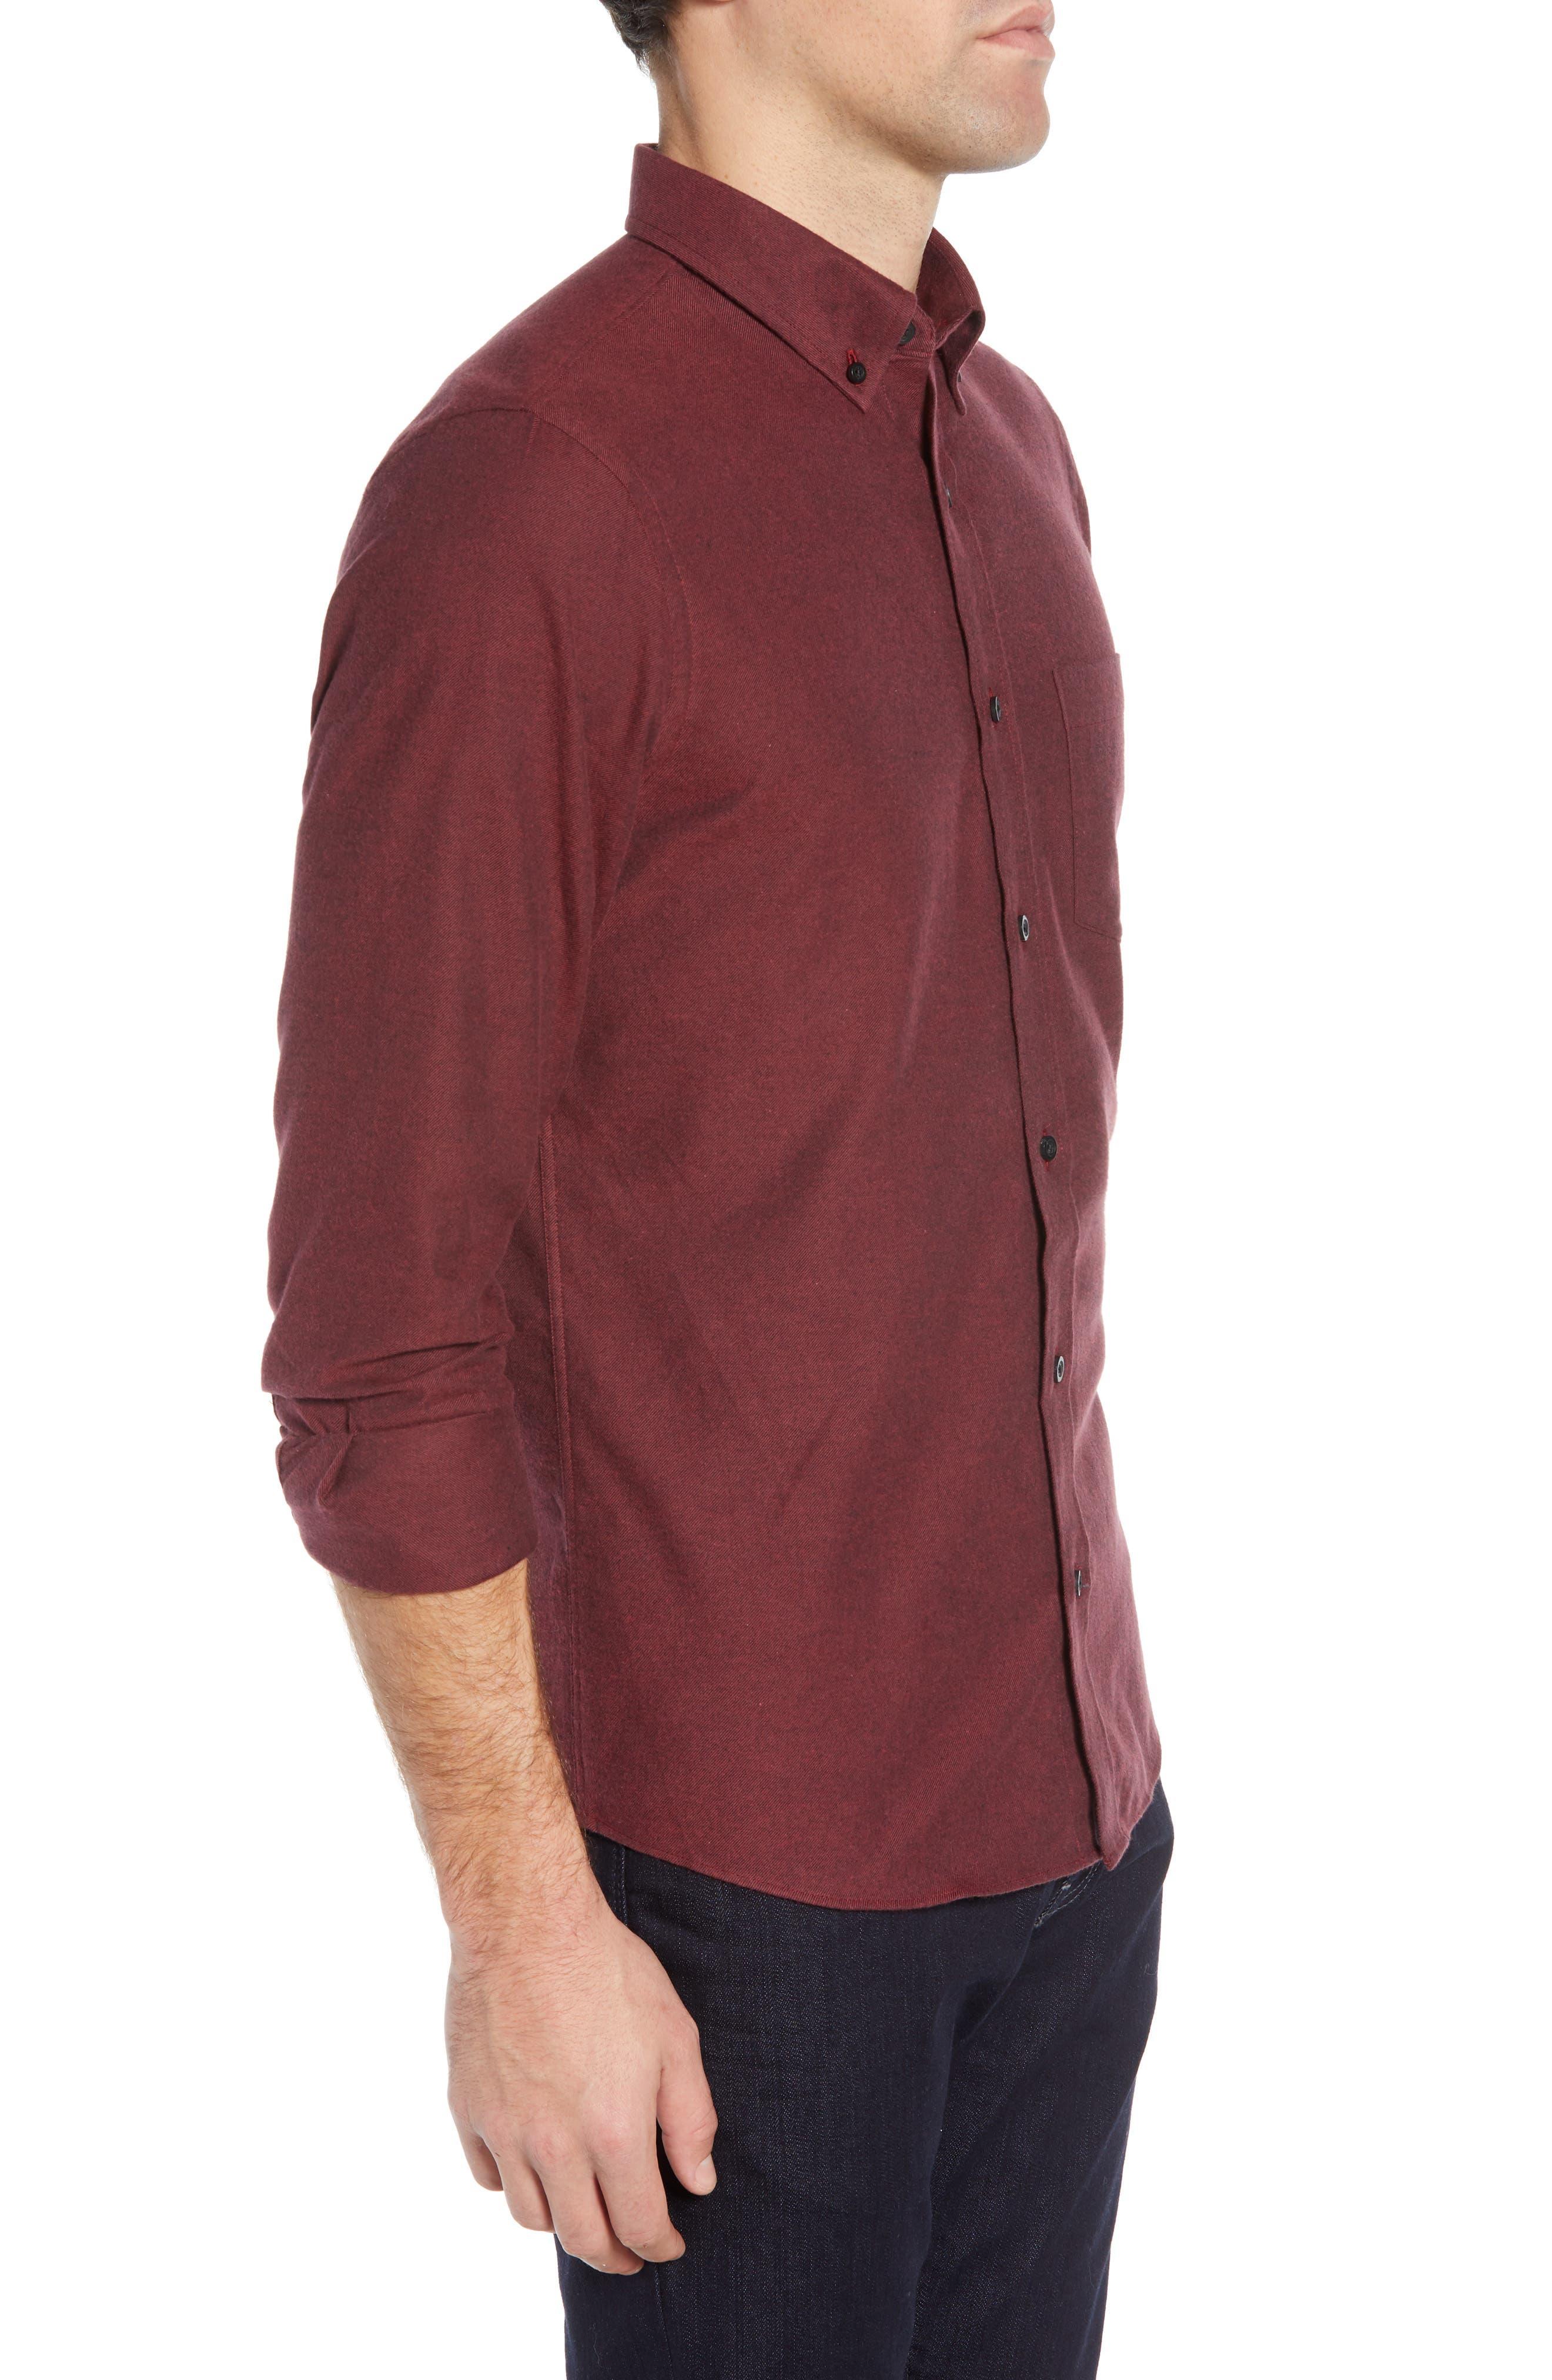 NORDSTROM MEN'S SHOP,                             Slim Fit Brushed Twill Sport Shirt,                             Alternate thumbnail 4, color,                             RED JESTER BRUSHED TWILL